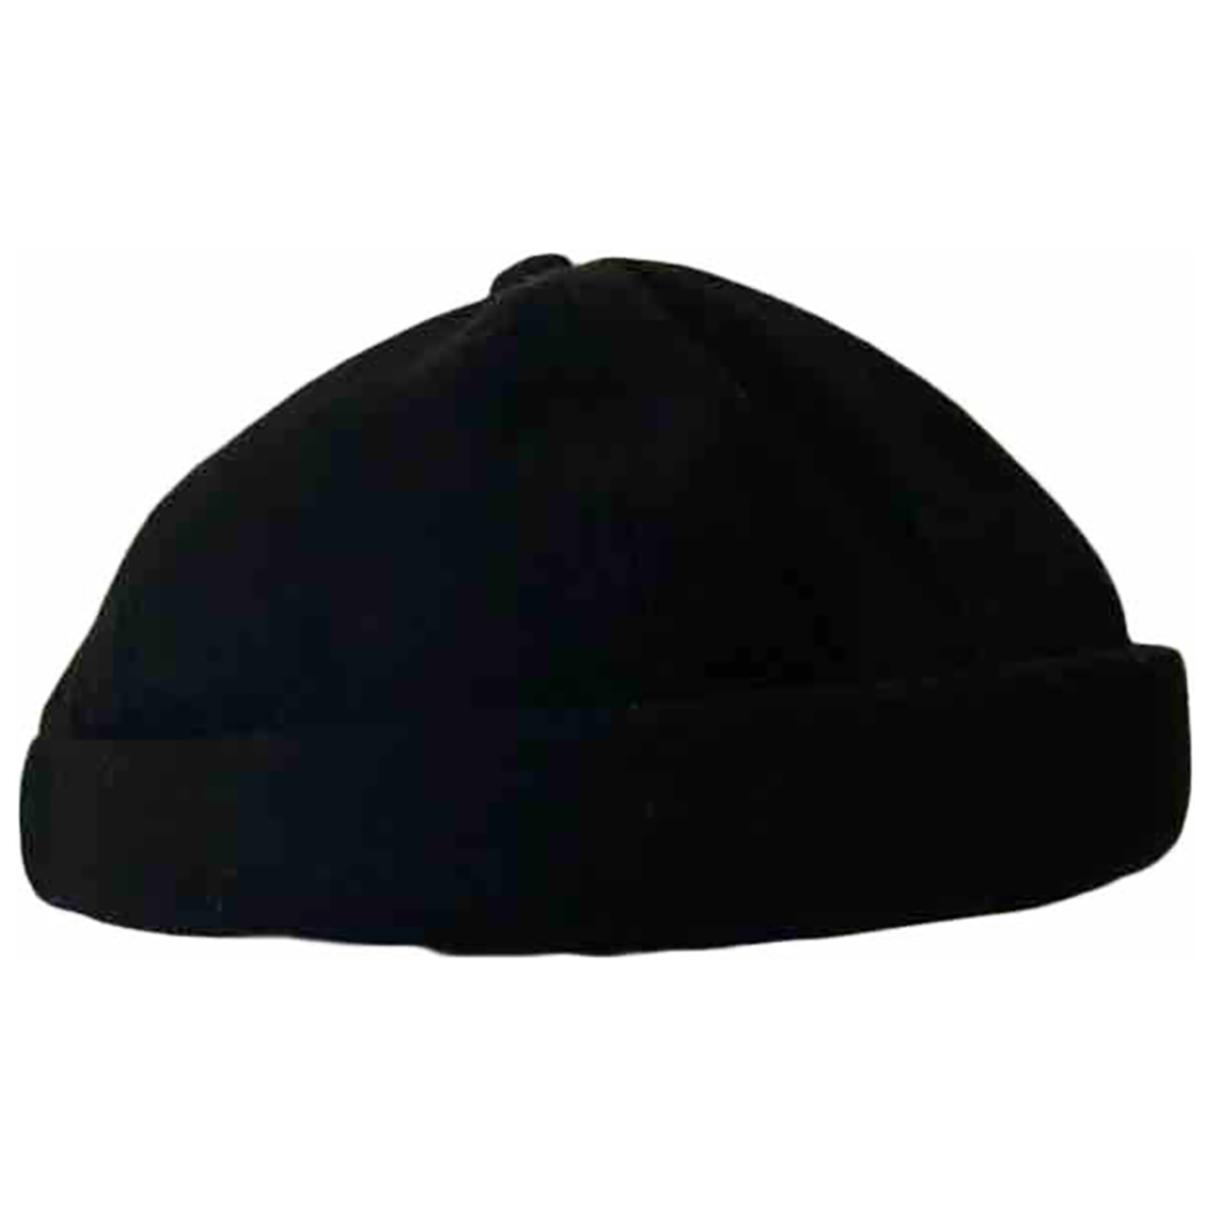 Sombrero / gorro Urban Outfitters